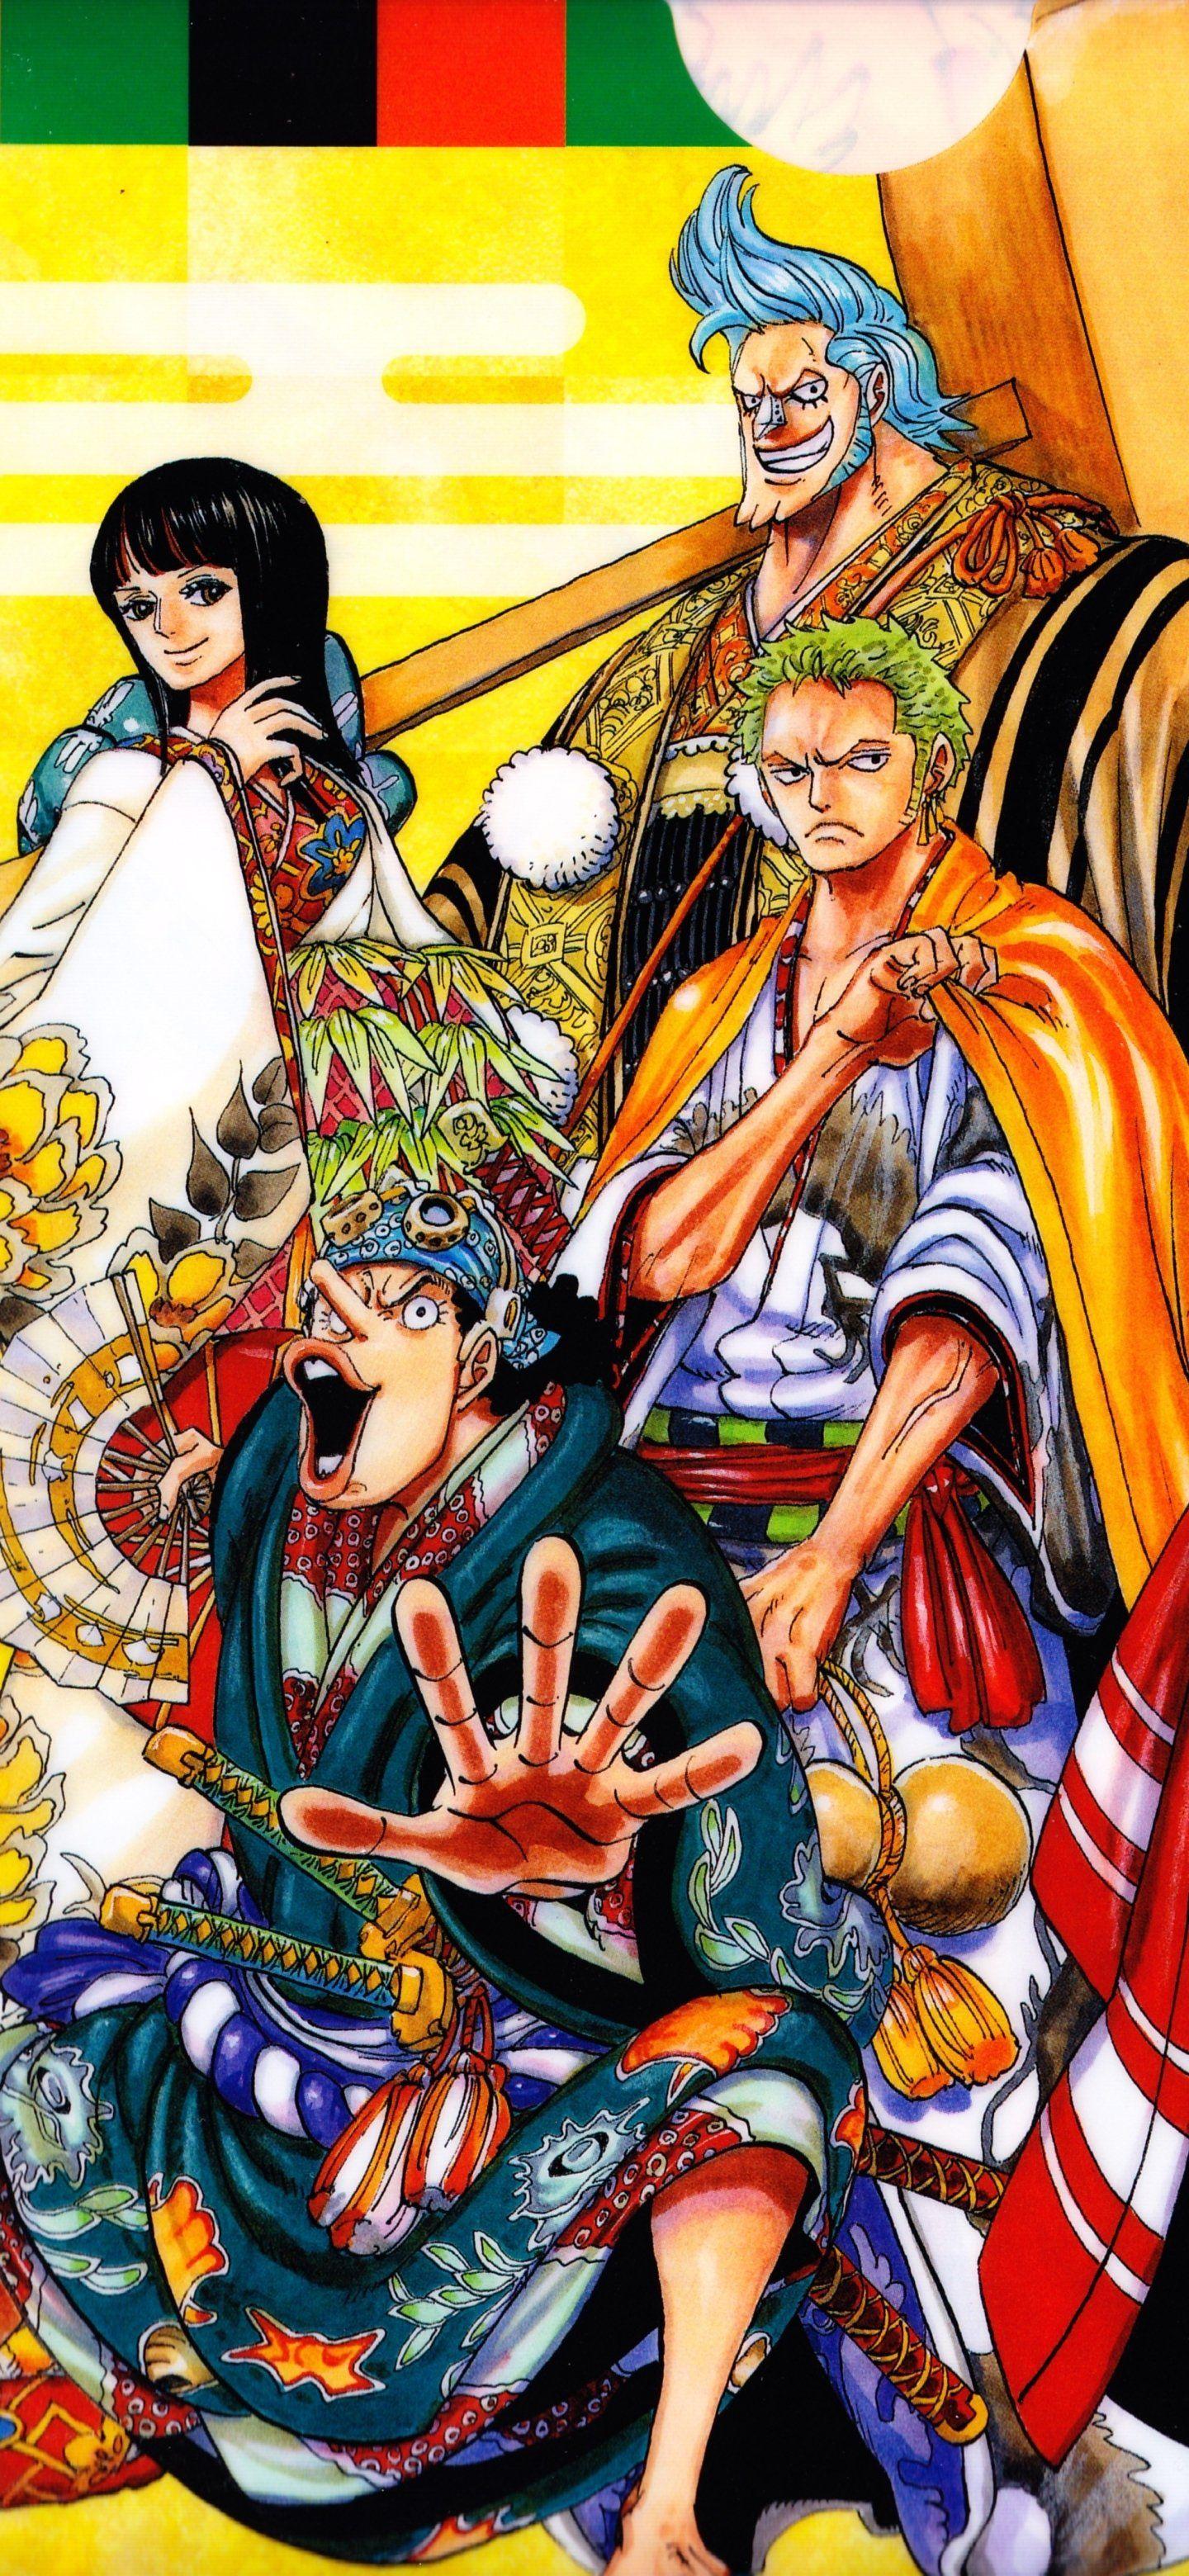 خلفيات انمي ون بيس One Piece للجوال One Piece Wallpaper Pieces